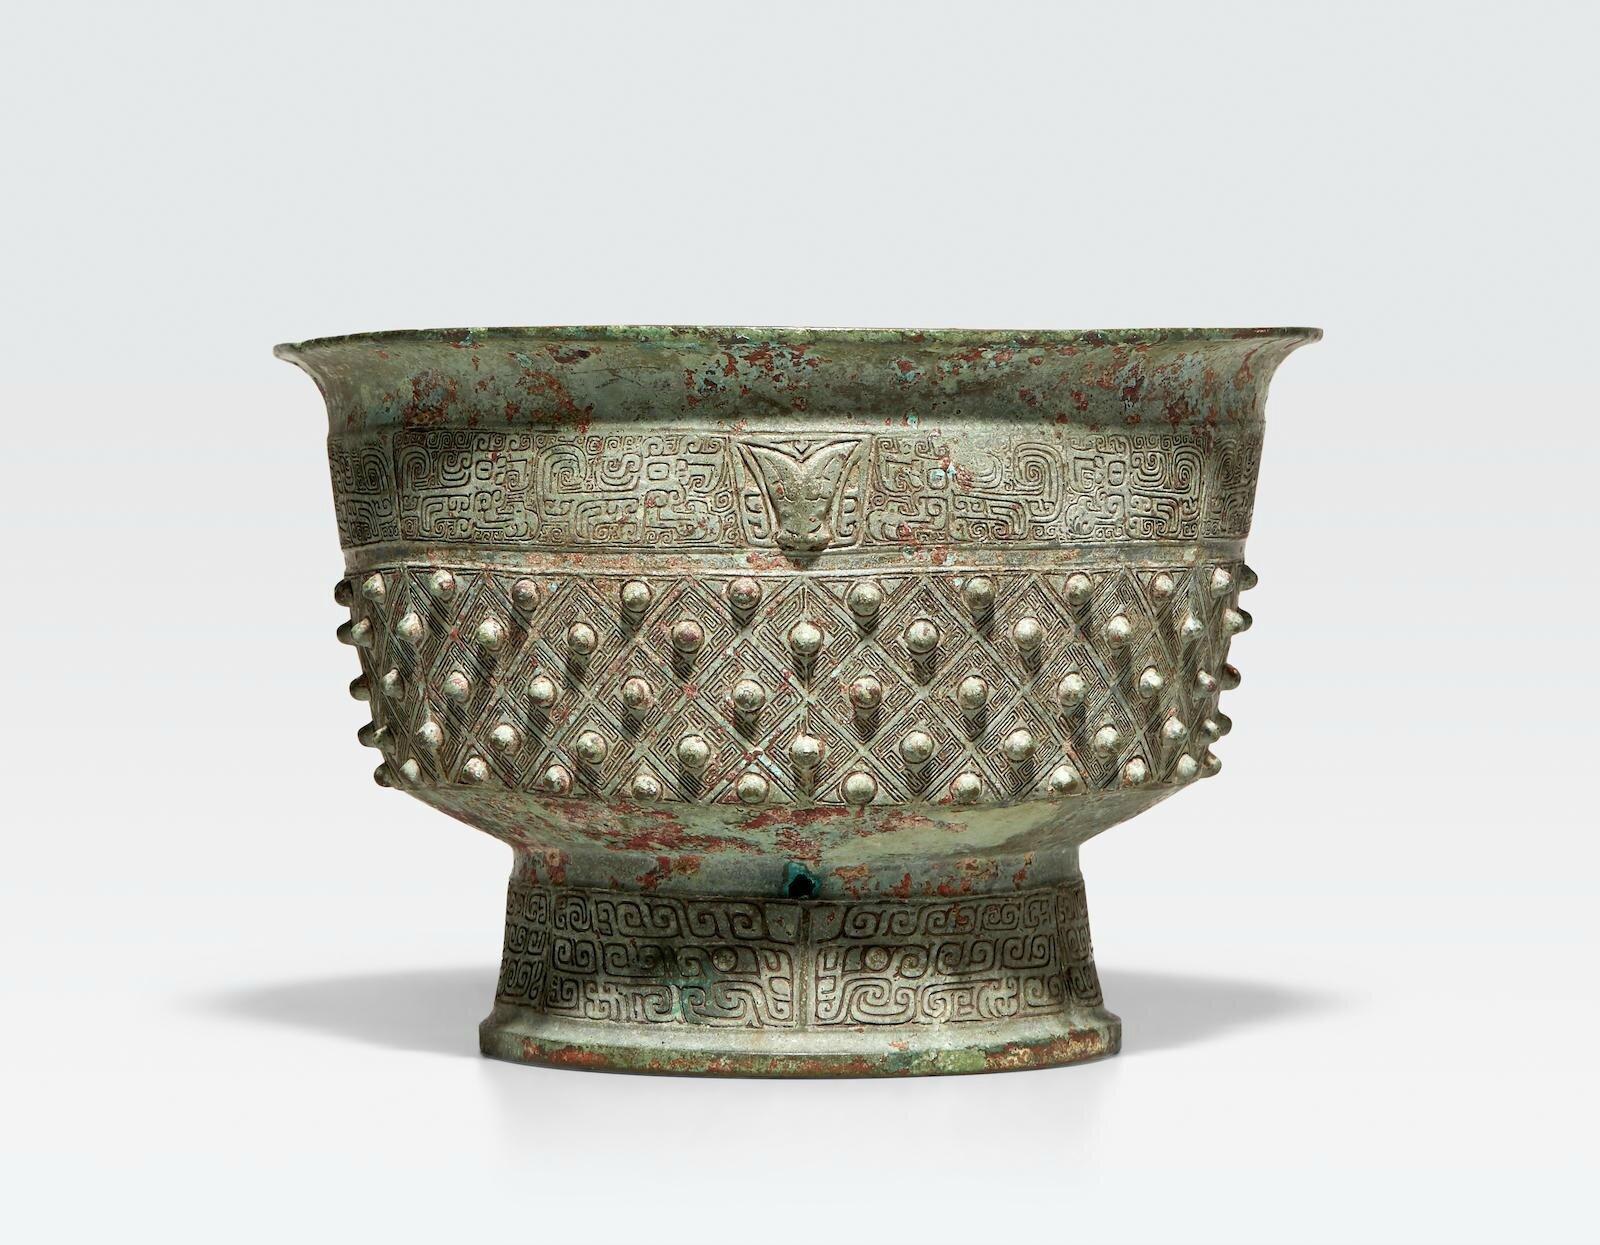 A rare archaic bronze ritual food vessel, Shi yu, Late Shang dynasty